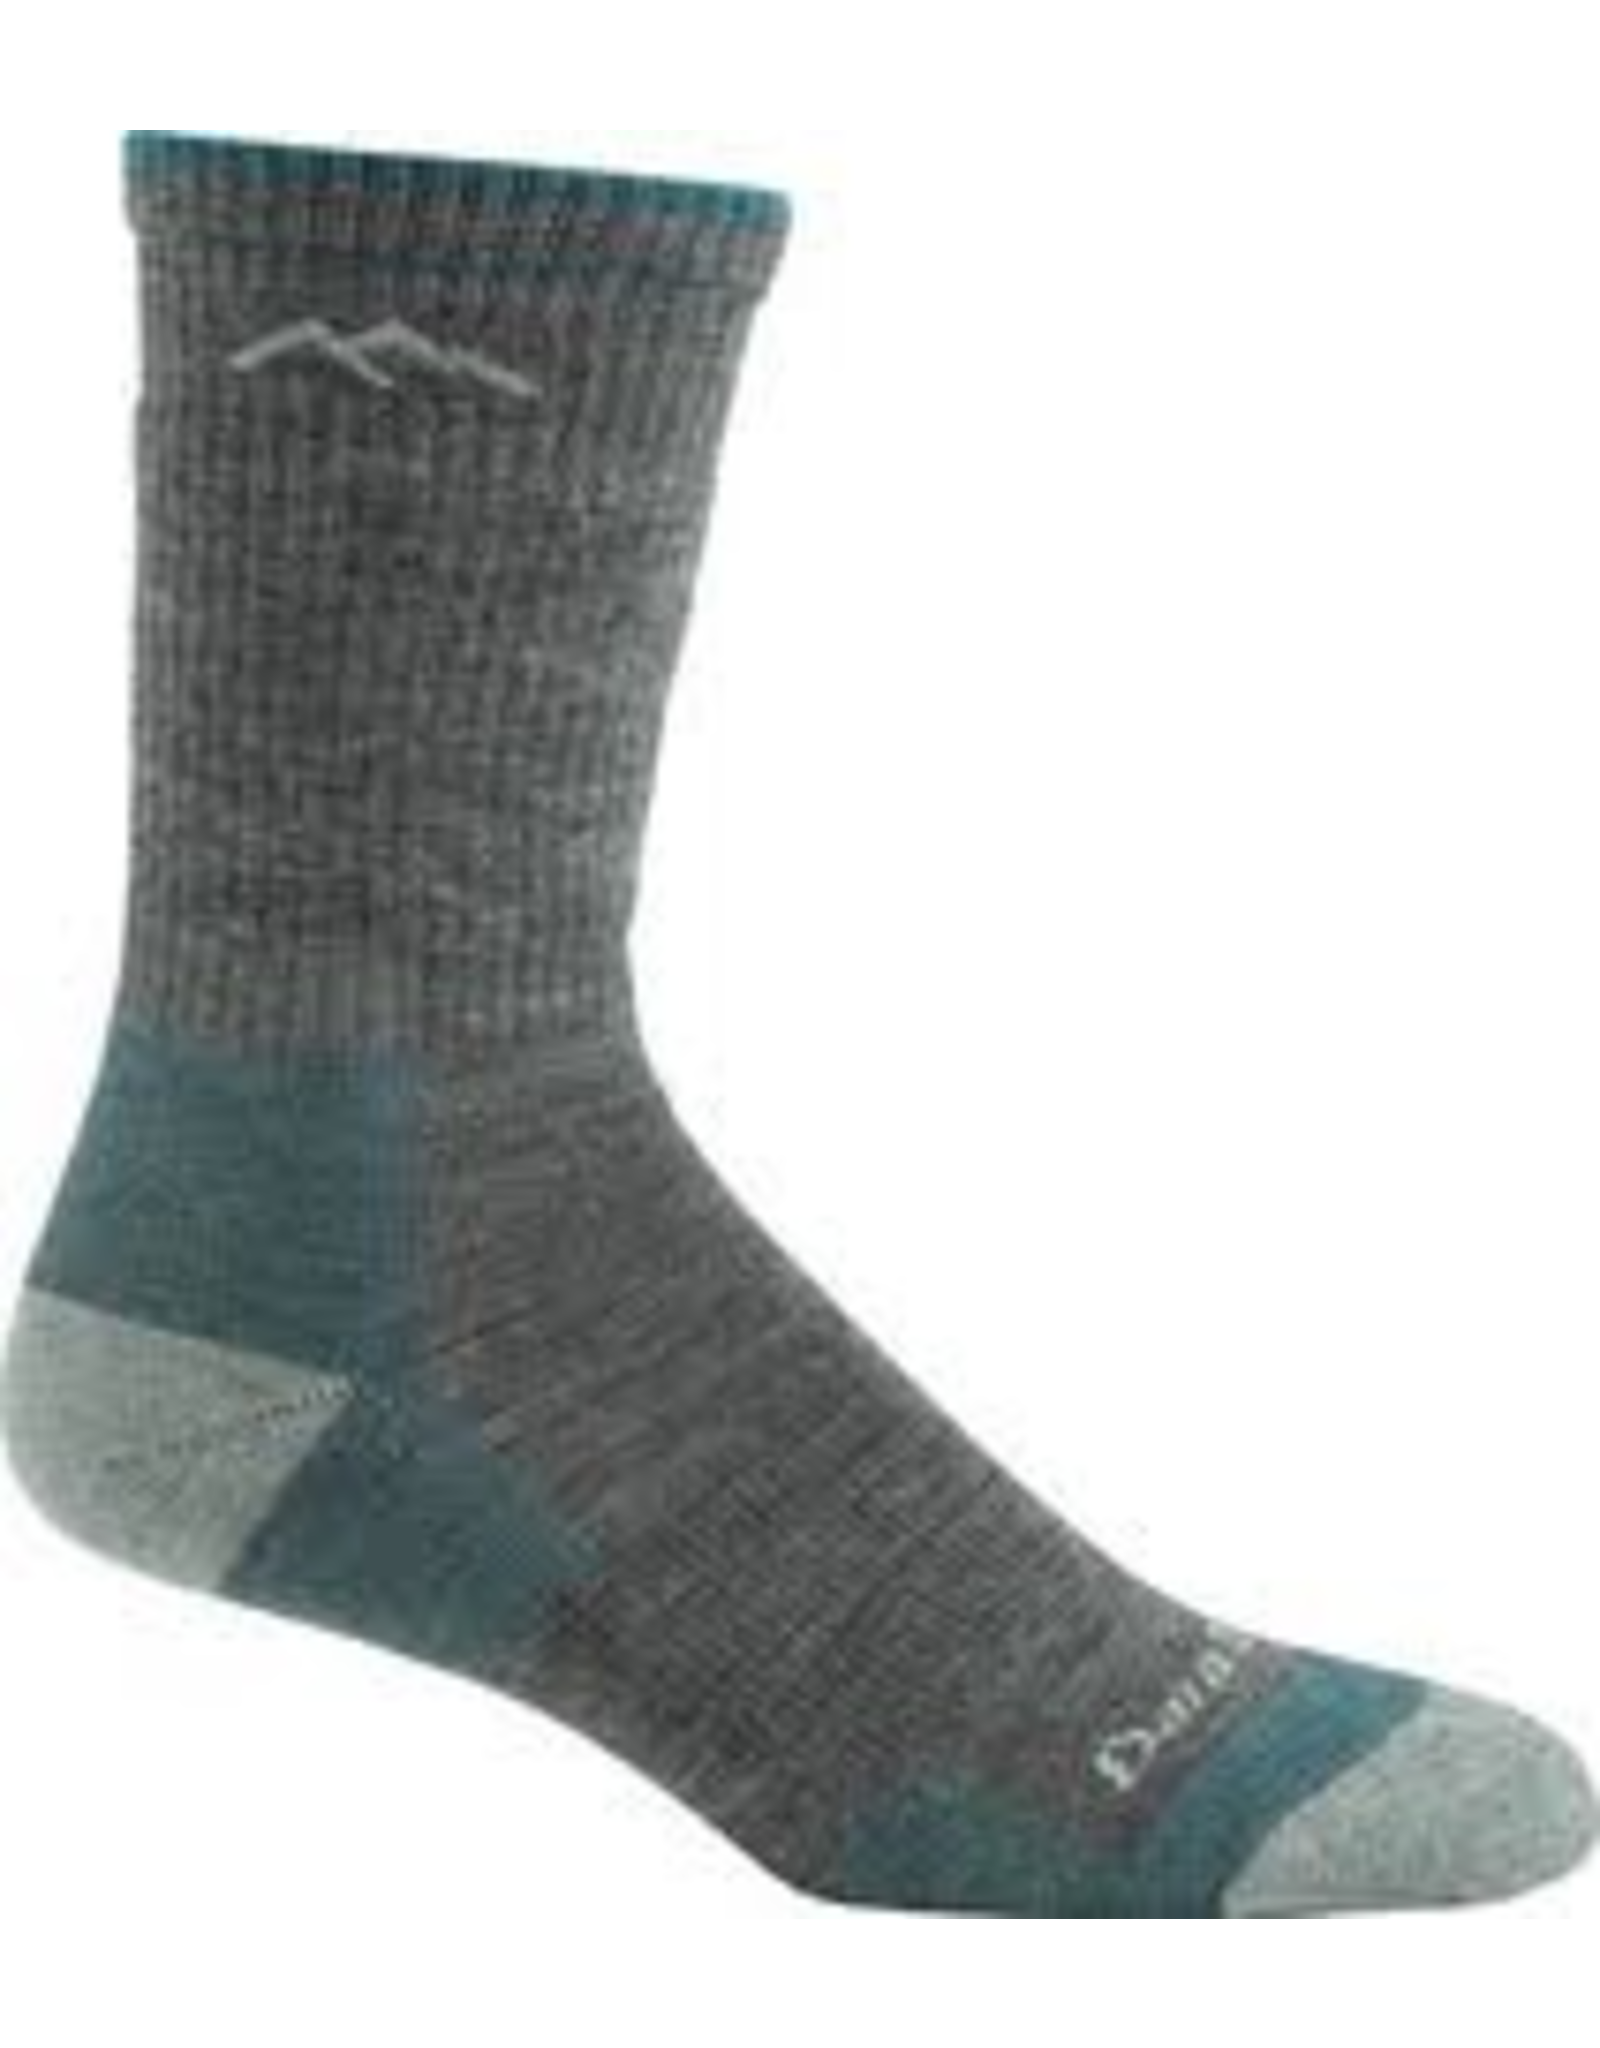 Darn Tough Darn Tough Womens Hike / Trek BOOT CUSHION Sock